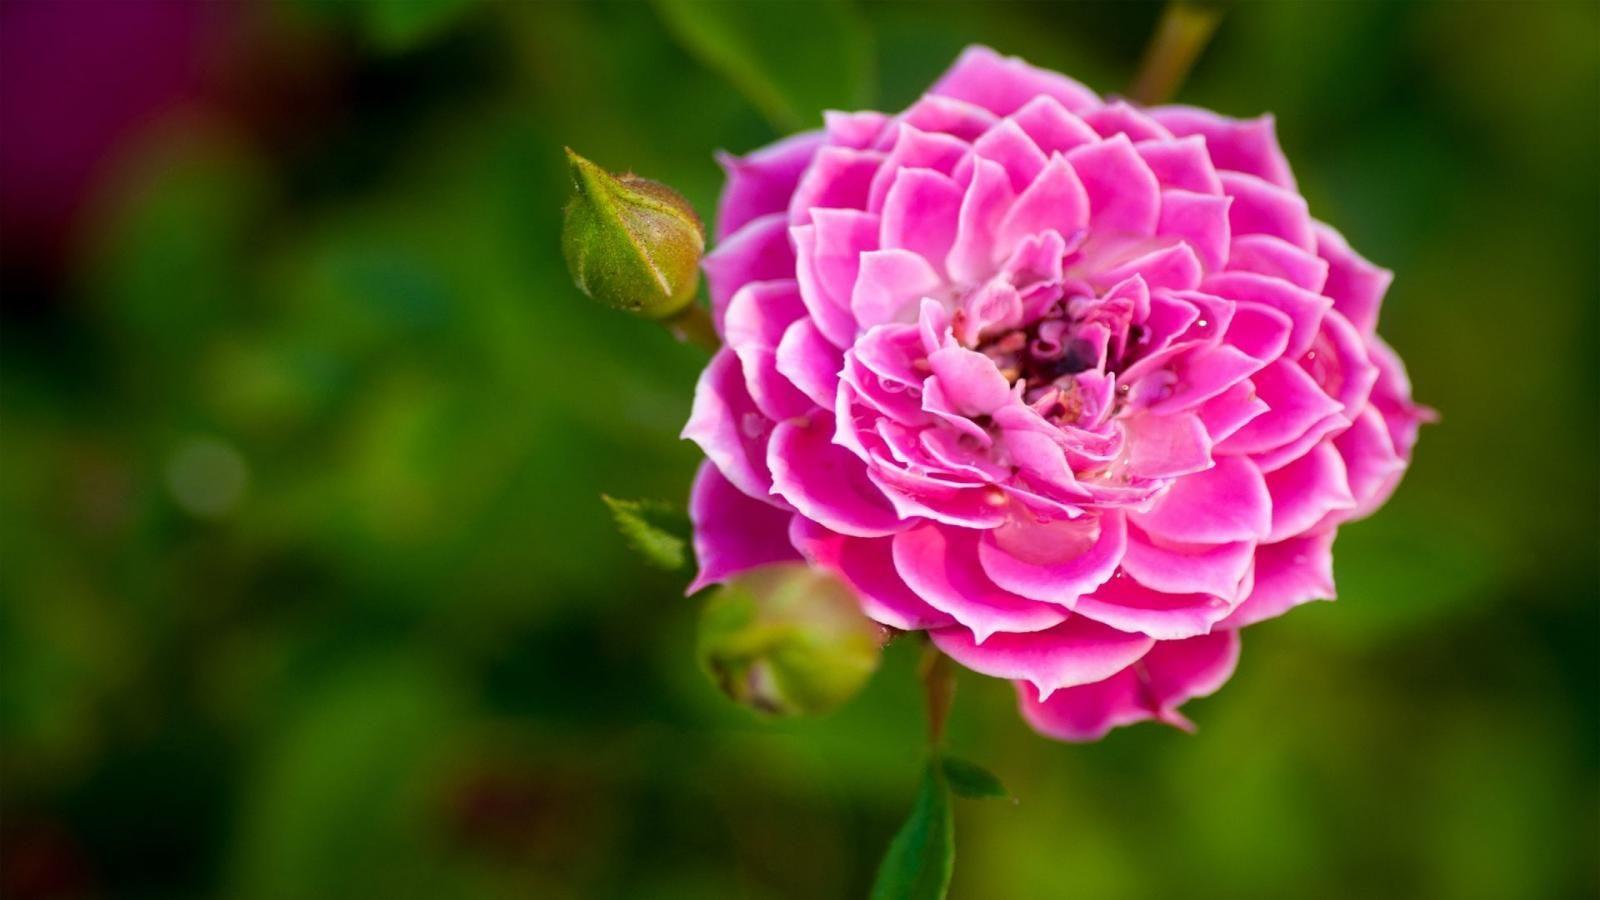 Pink big beautiful flowers on light green wallpapers - Big rose flower wallpaper ...